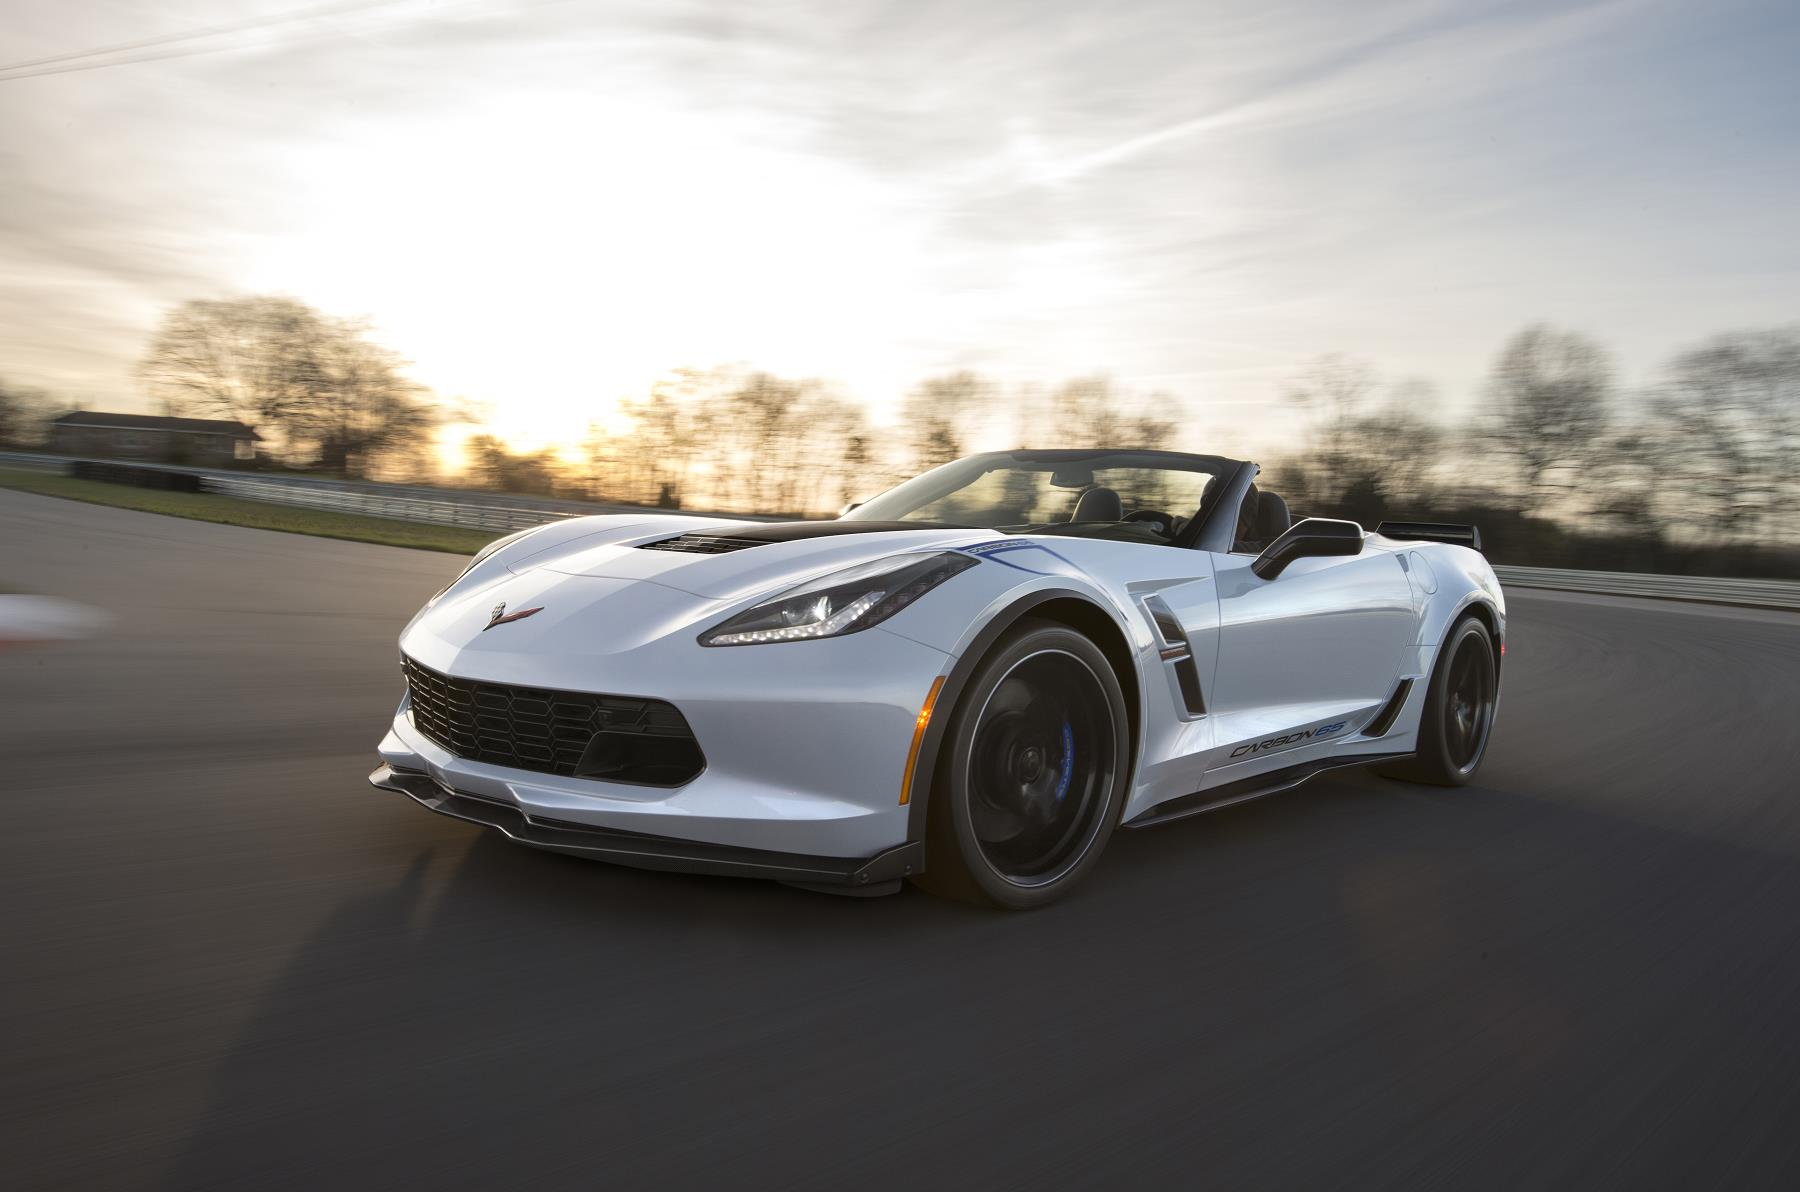 Official: 2018 Chevrolet Corvette Carbon 65 Edition – 650 Units Only